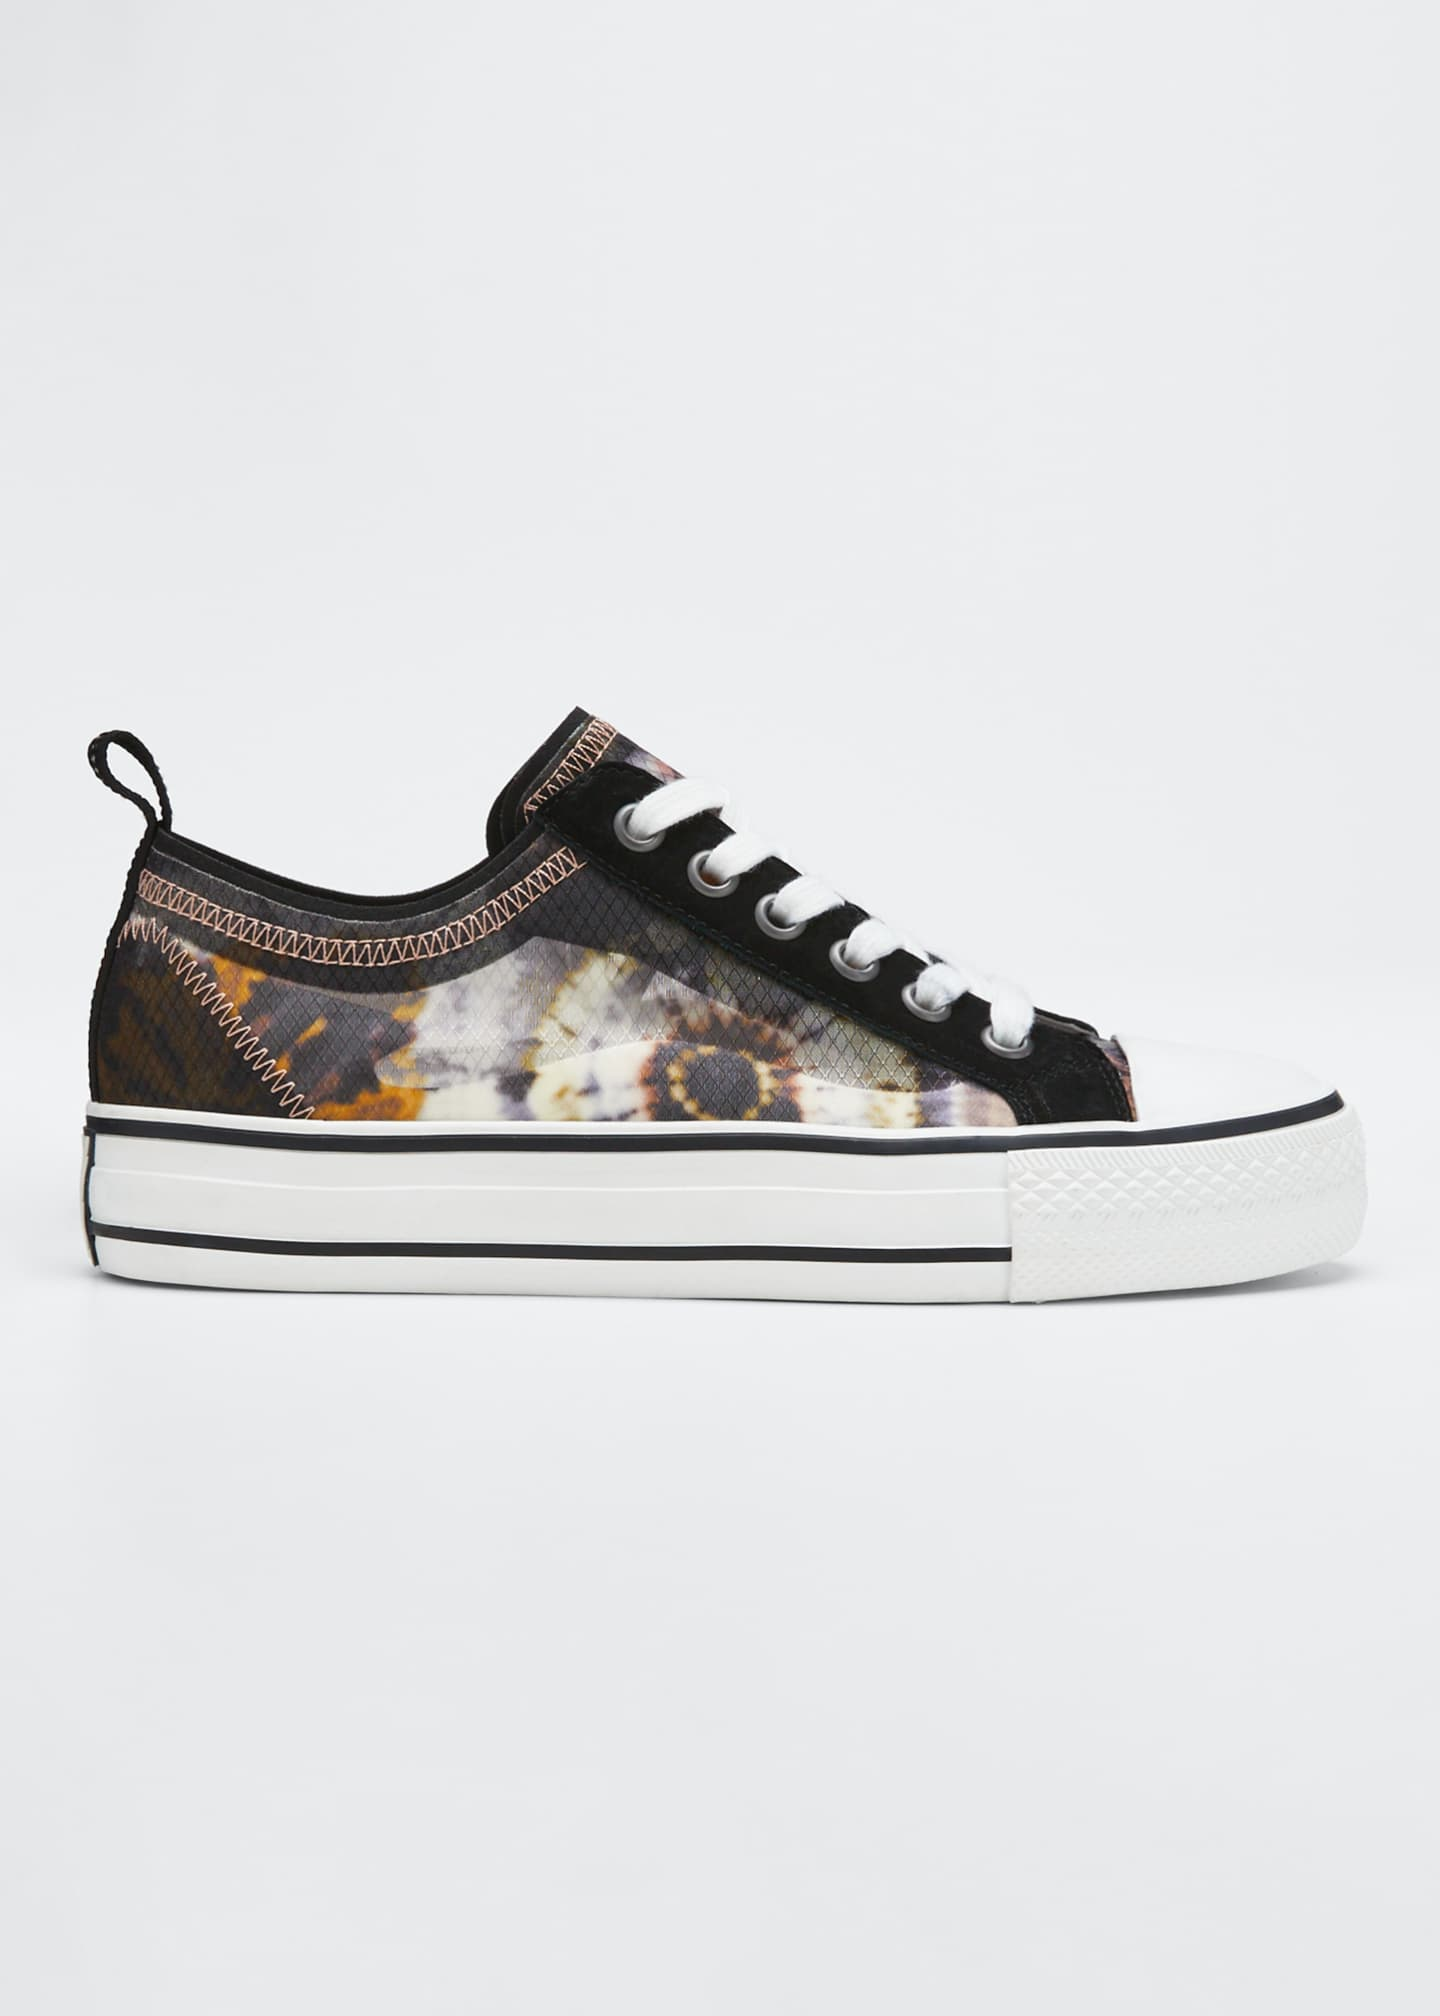 Ash Vertu Floral-Print Court Sneakers